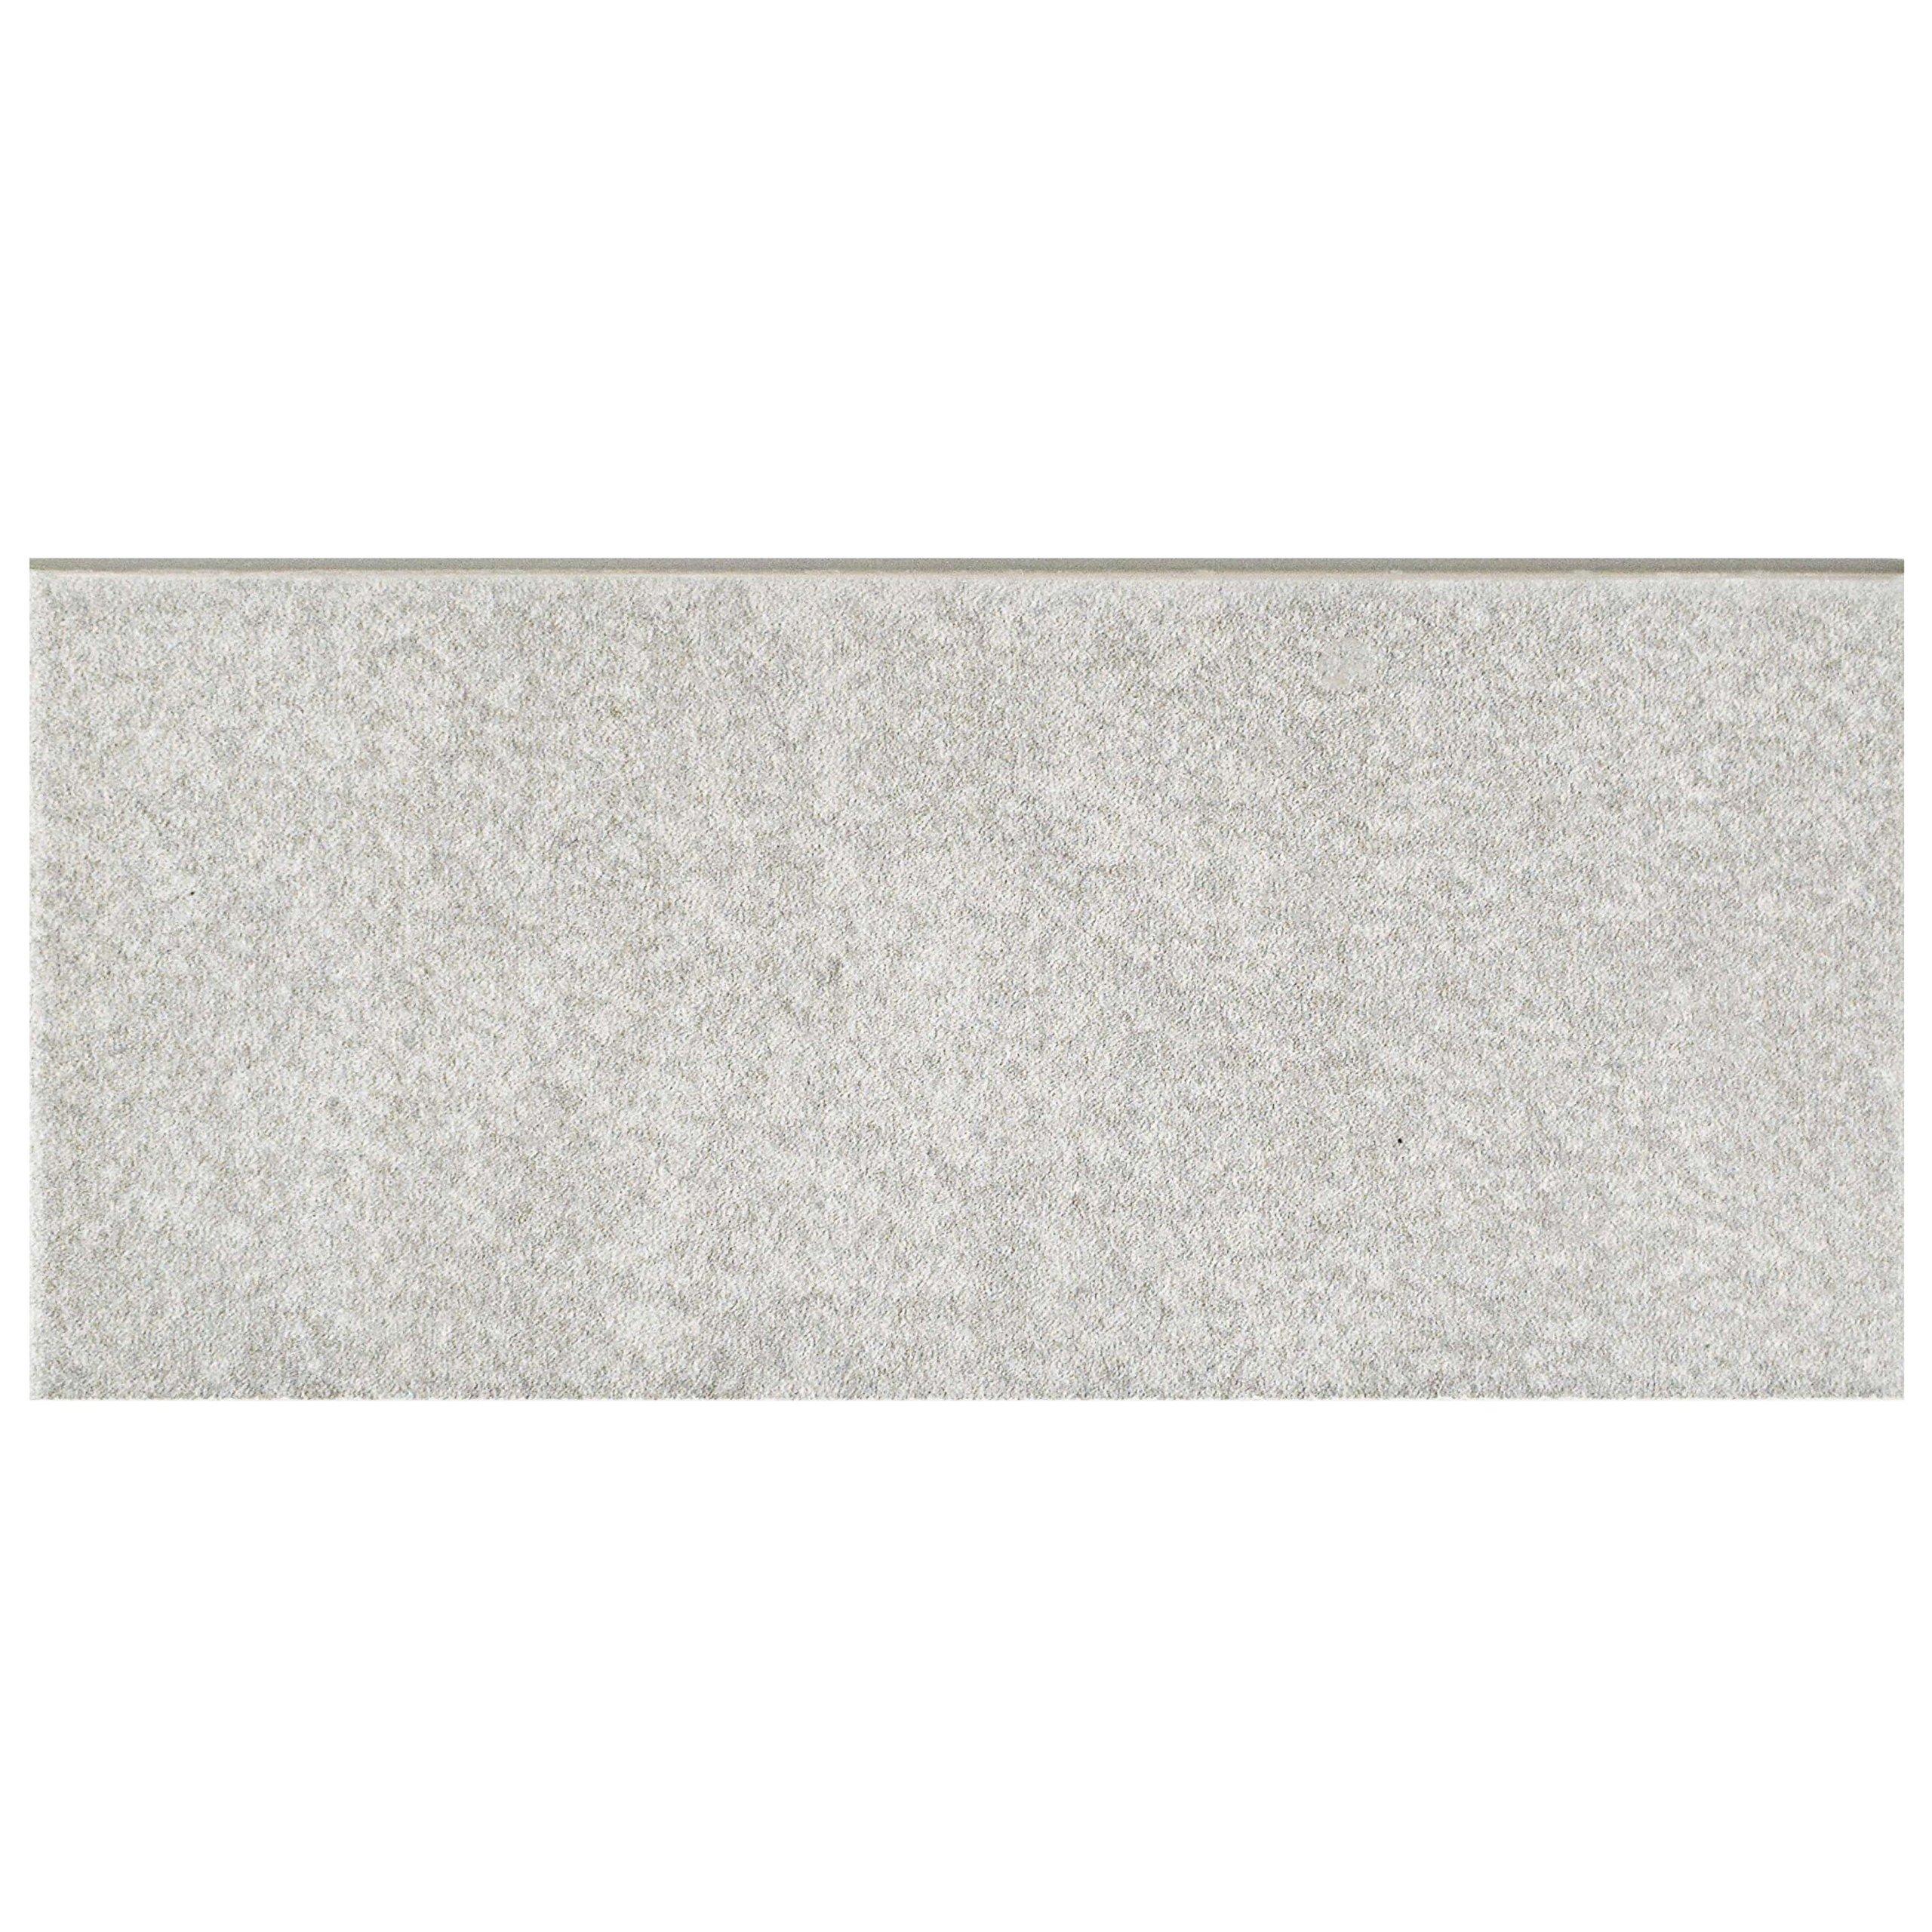 SomerTile FRC8TWGB Fifties Ceramic Bullnose Floor and Wall Trim Tile, 3.5'' x 7.75'', Grey